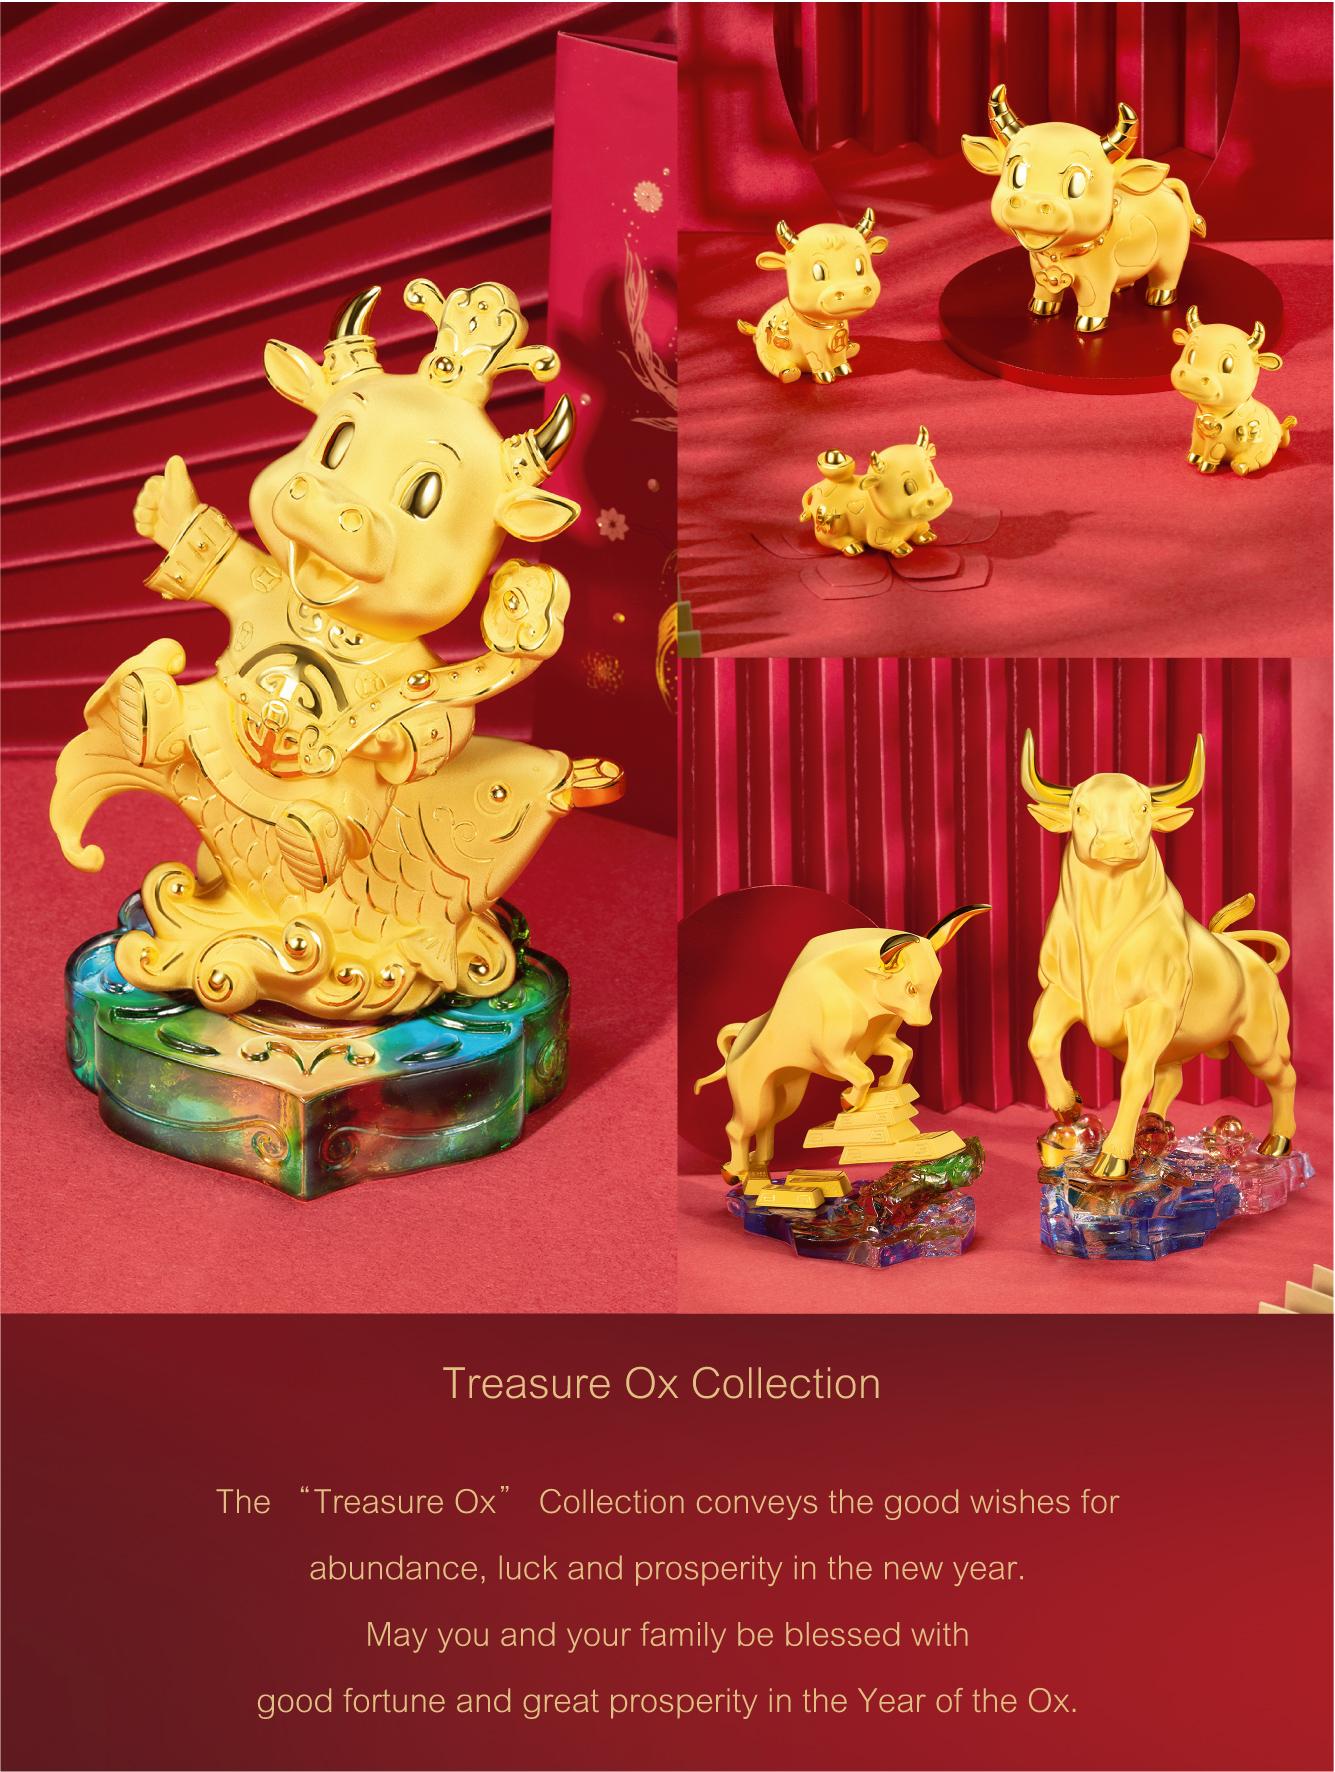 Treasure Ox Collection